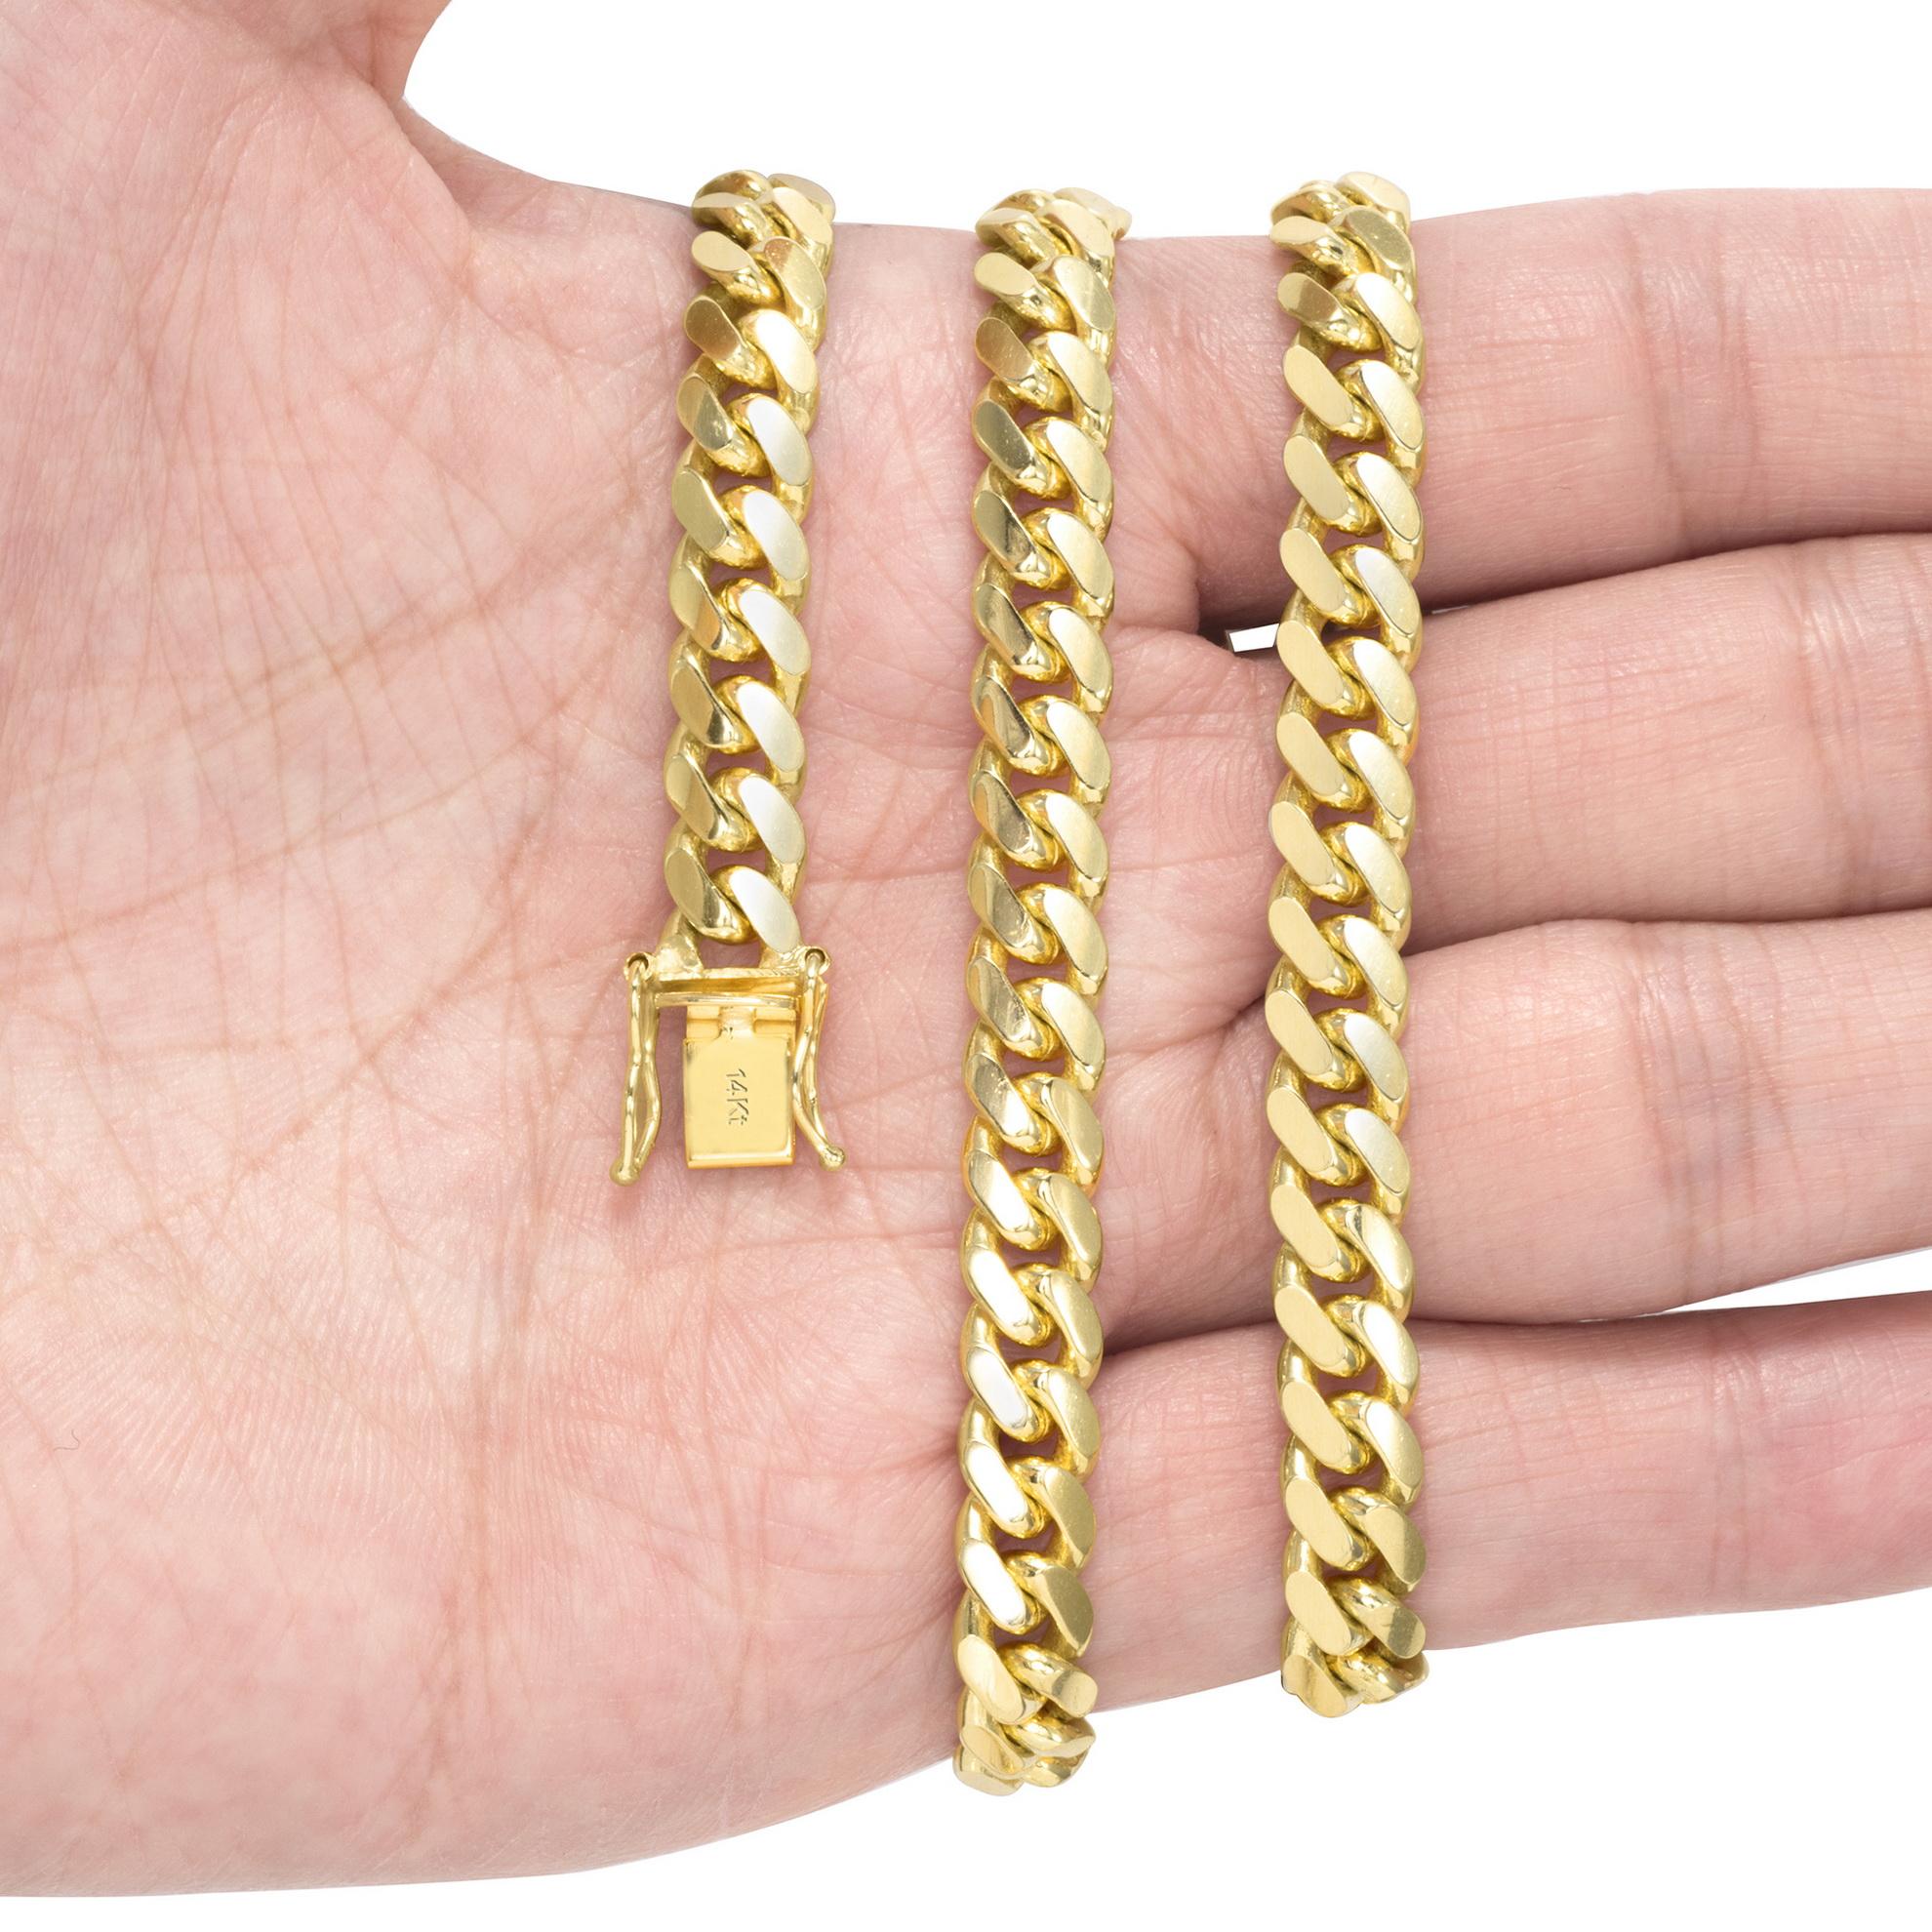 14K-Yellow-Gold-Solid-2-7mm-11mm-Miami-Cuban-Link-Chain-Bracelet-Men-Women-7-034-9-034 thumbnail 23